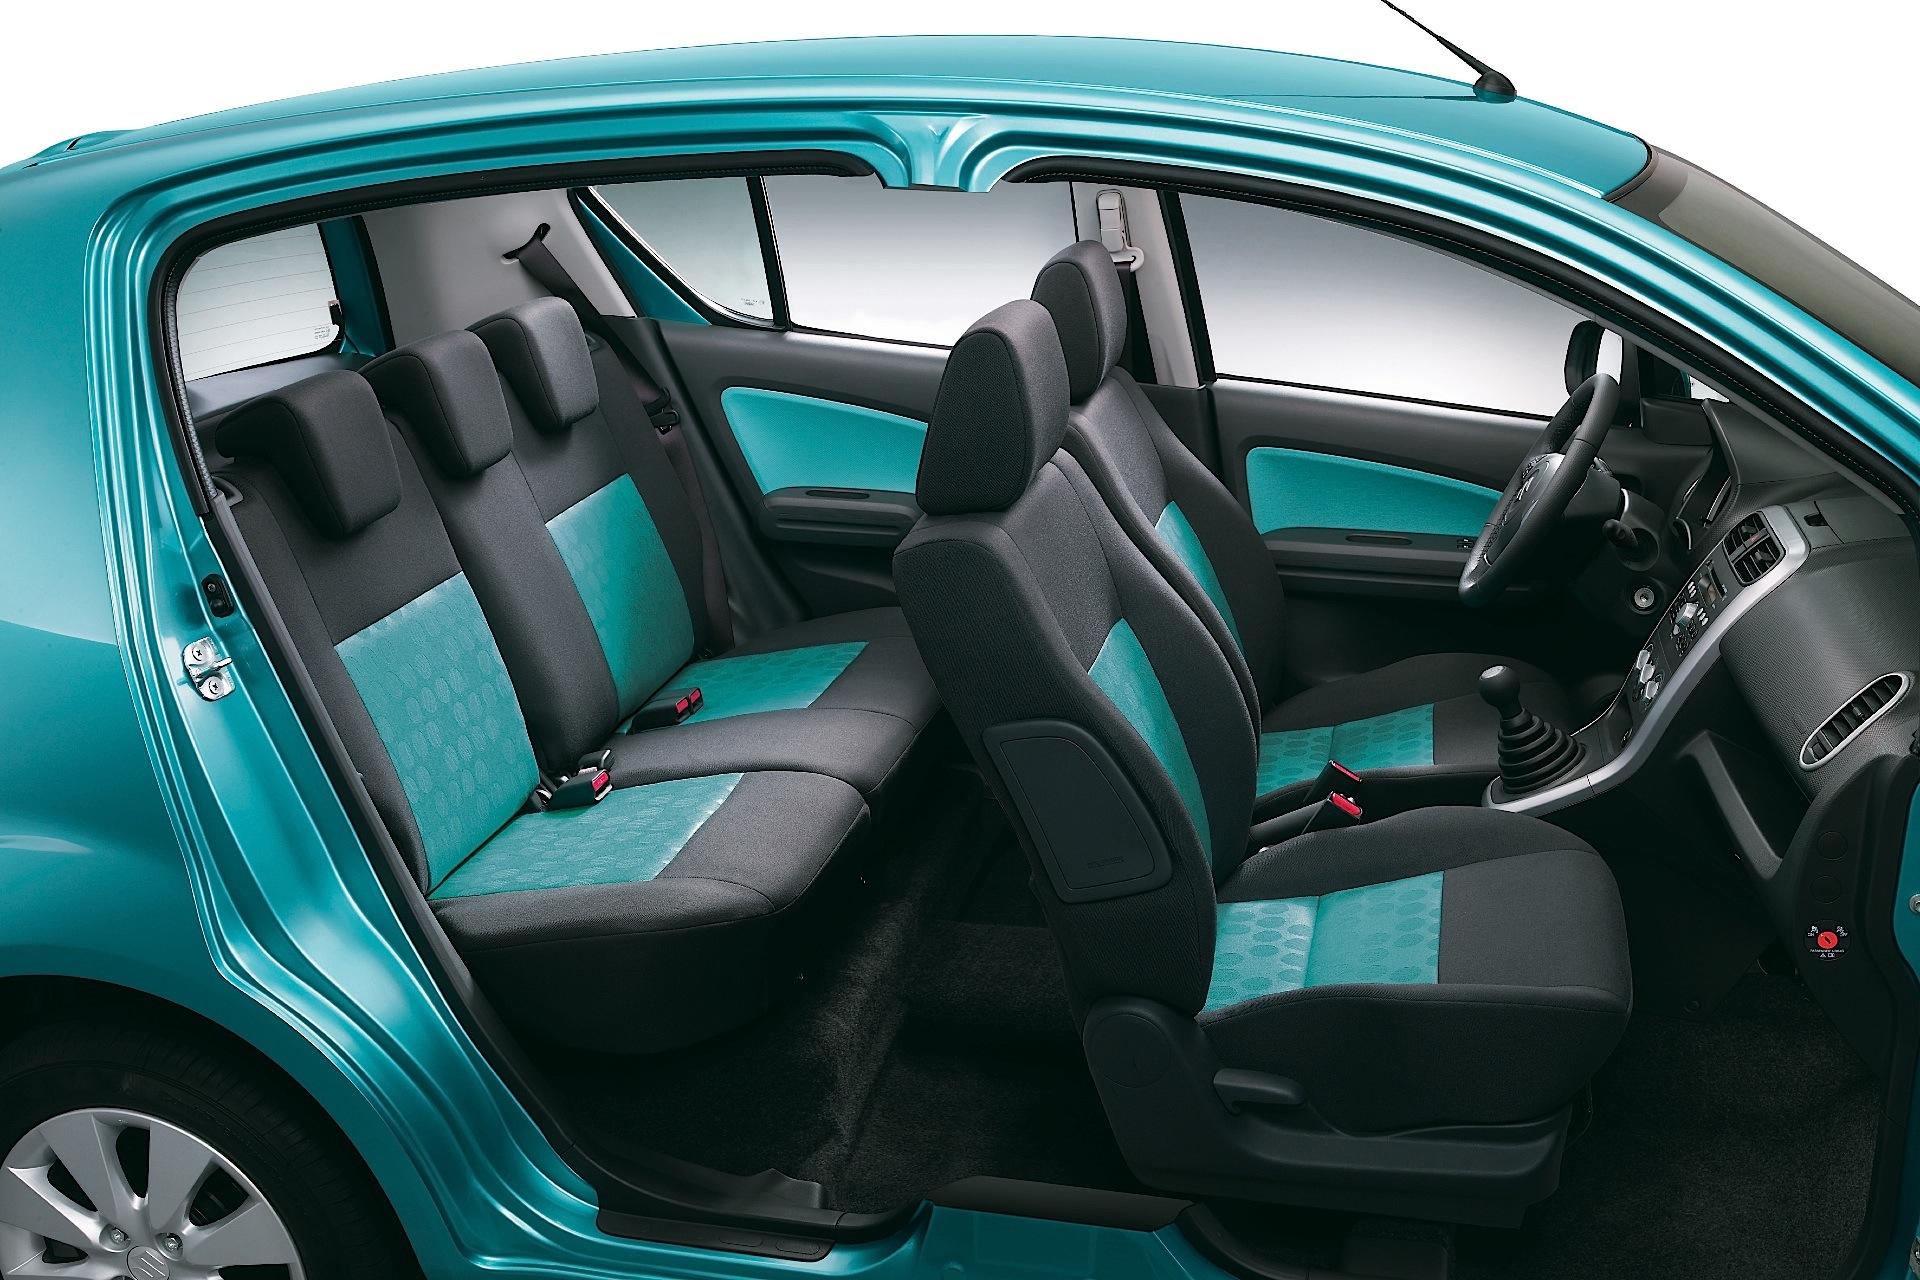 Suzuki Splash 2007 2008 2009 2010 2011 2012 2013 2014 2015 2016 Autoevolution